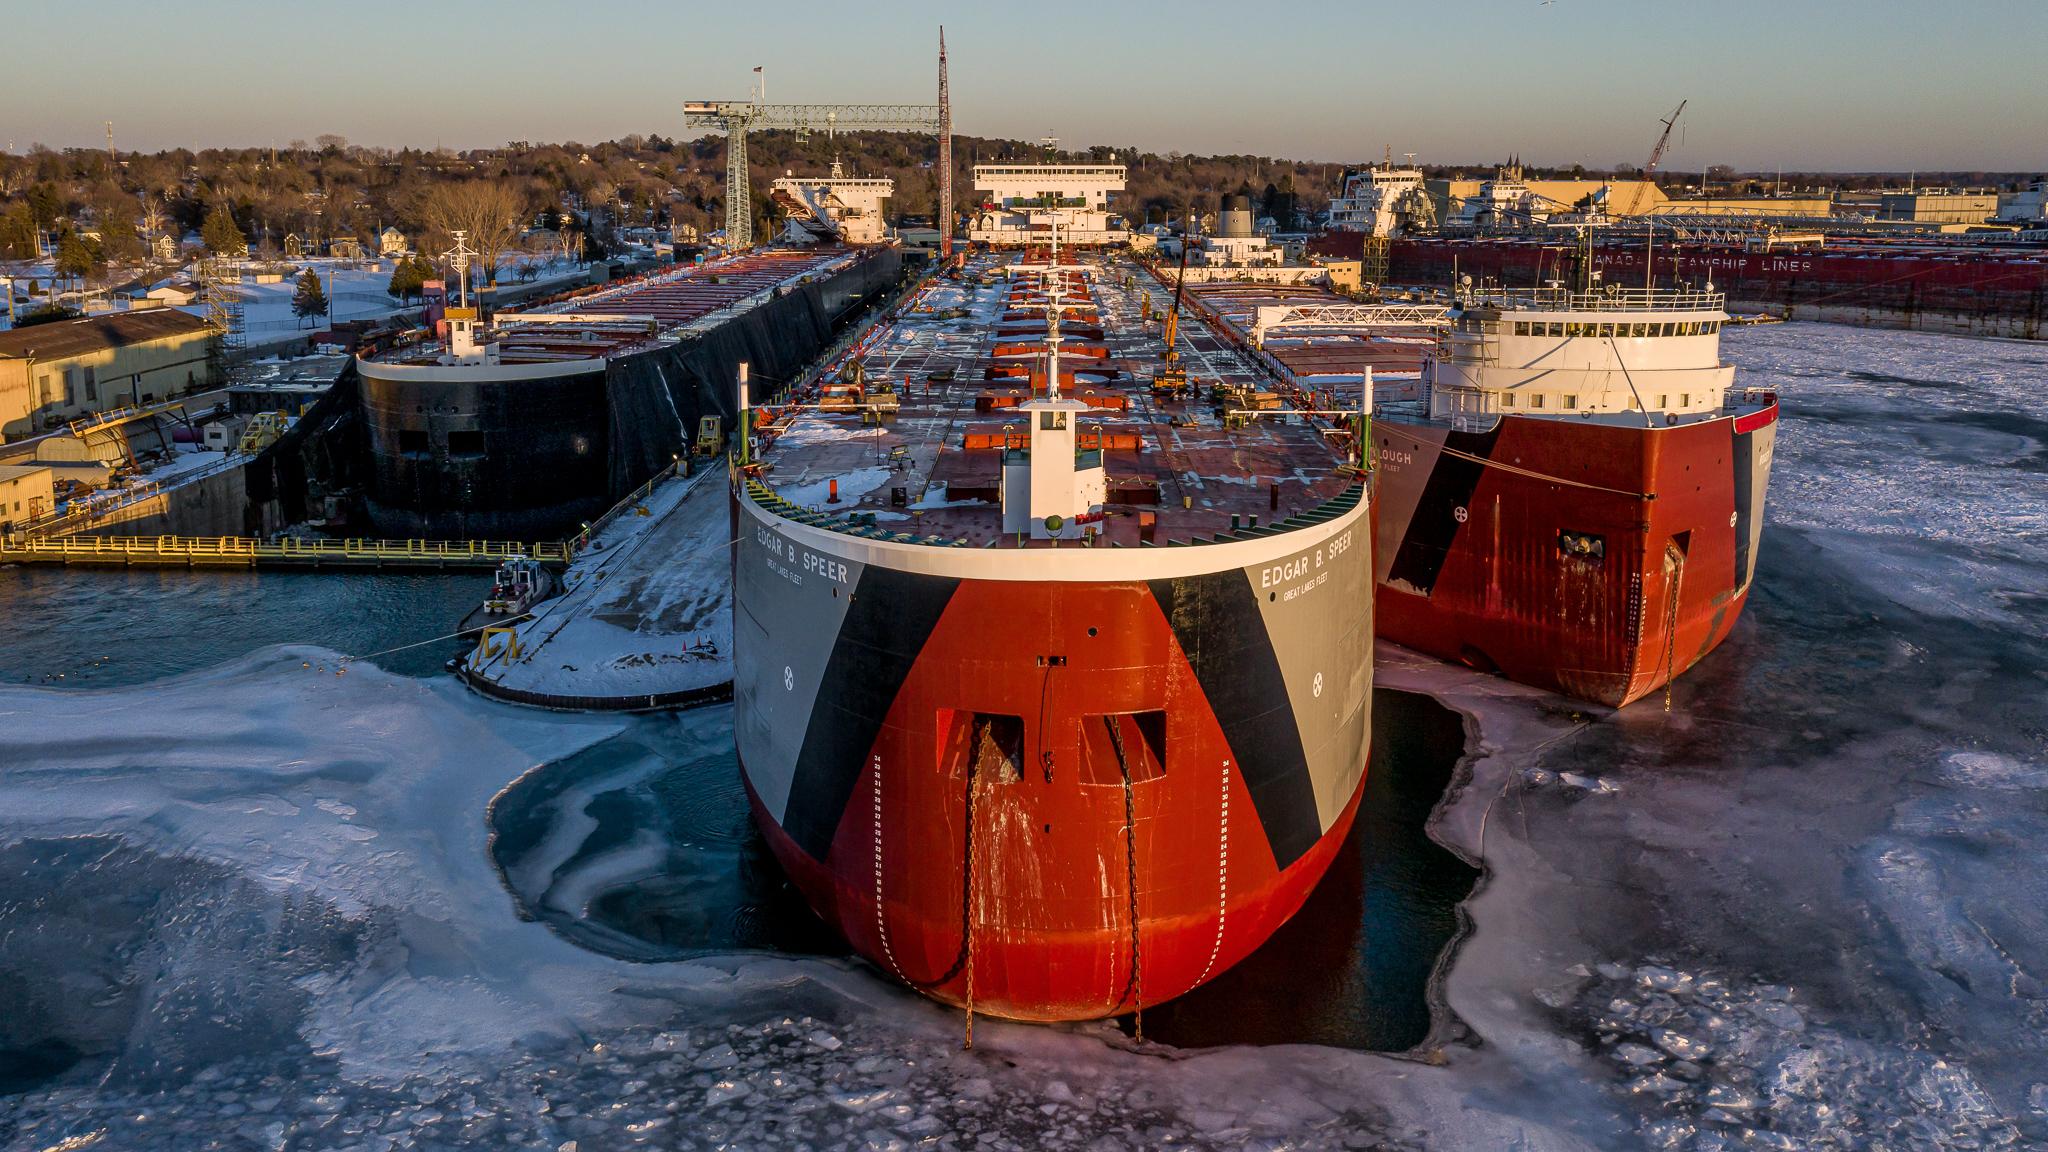 freighter ships docked at bay shipbuilding in sturgeon bay, door county, wisconsin